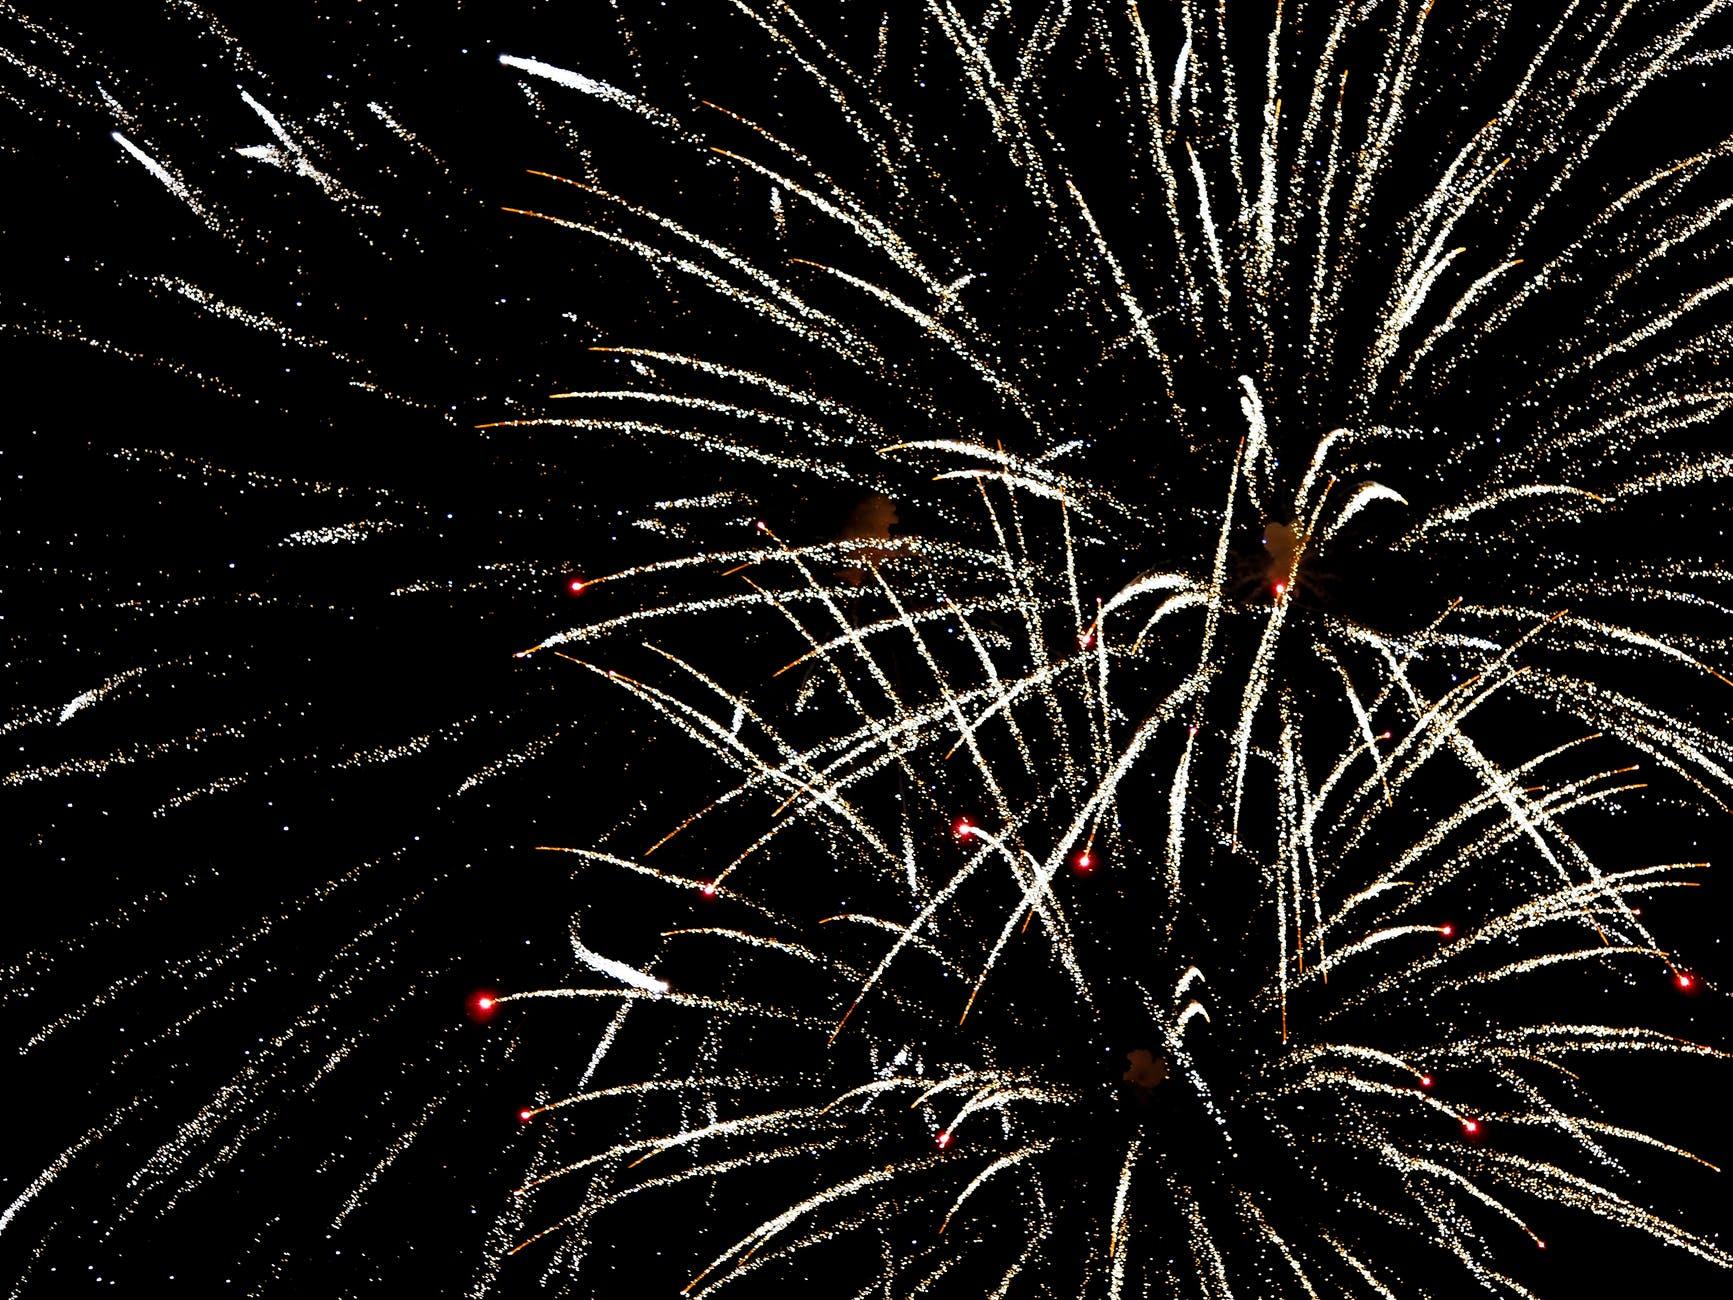 orange and white fireworks display